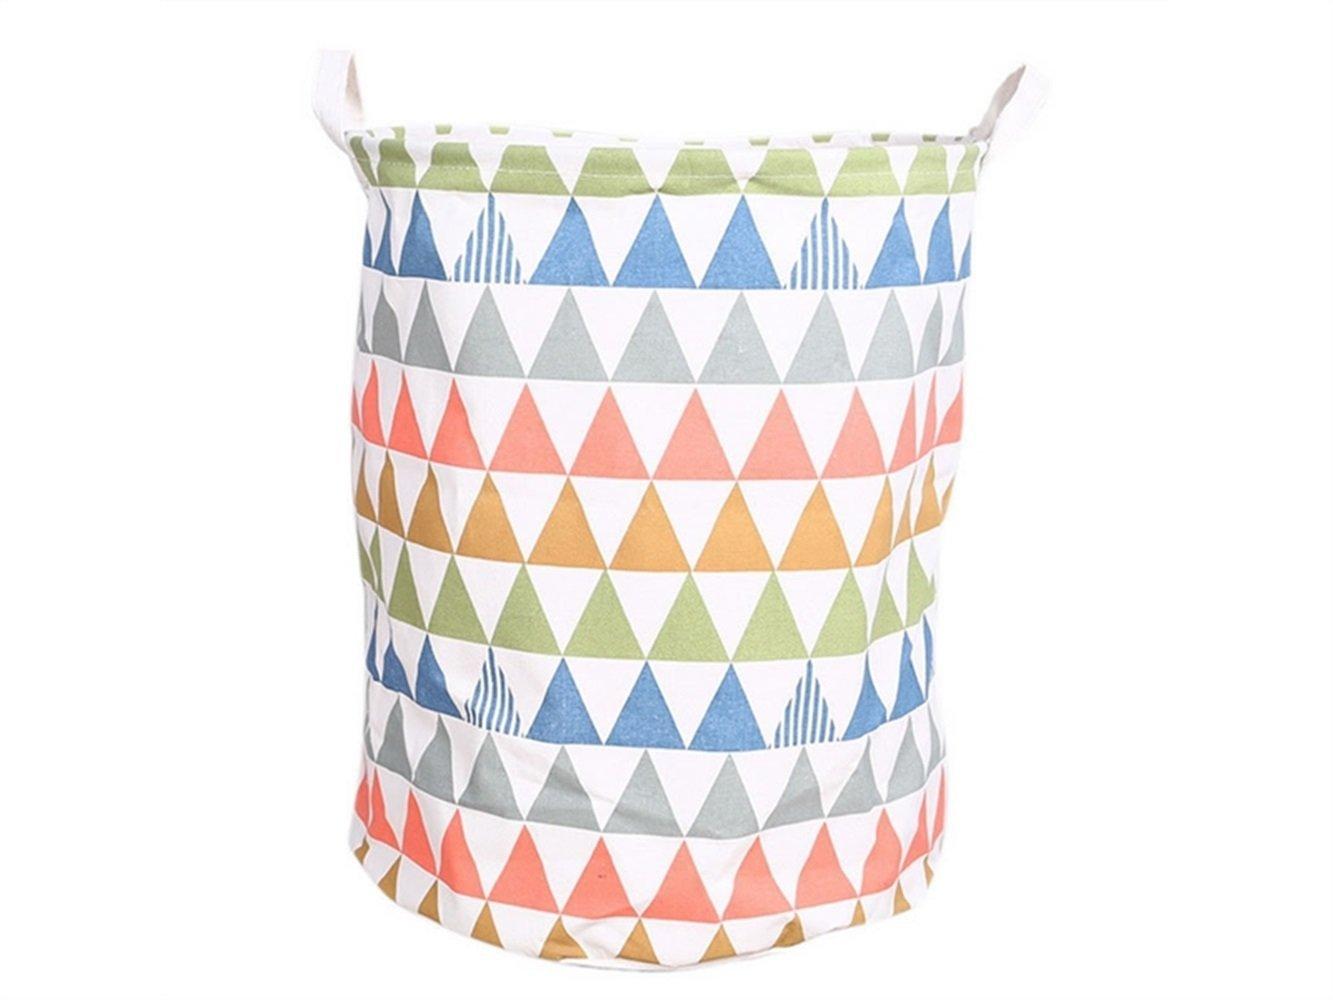 Gelaiken Lightweight Colored Triangle Pattern Storage Bucket Cotton and Linen Bucket Sundries Storage Bucket Waterproof Storage Bucket